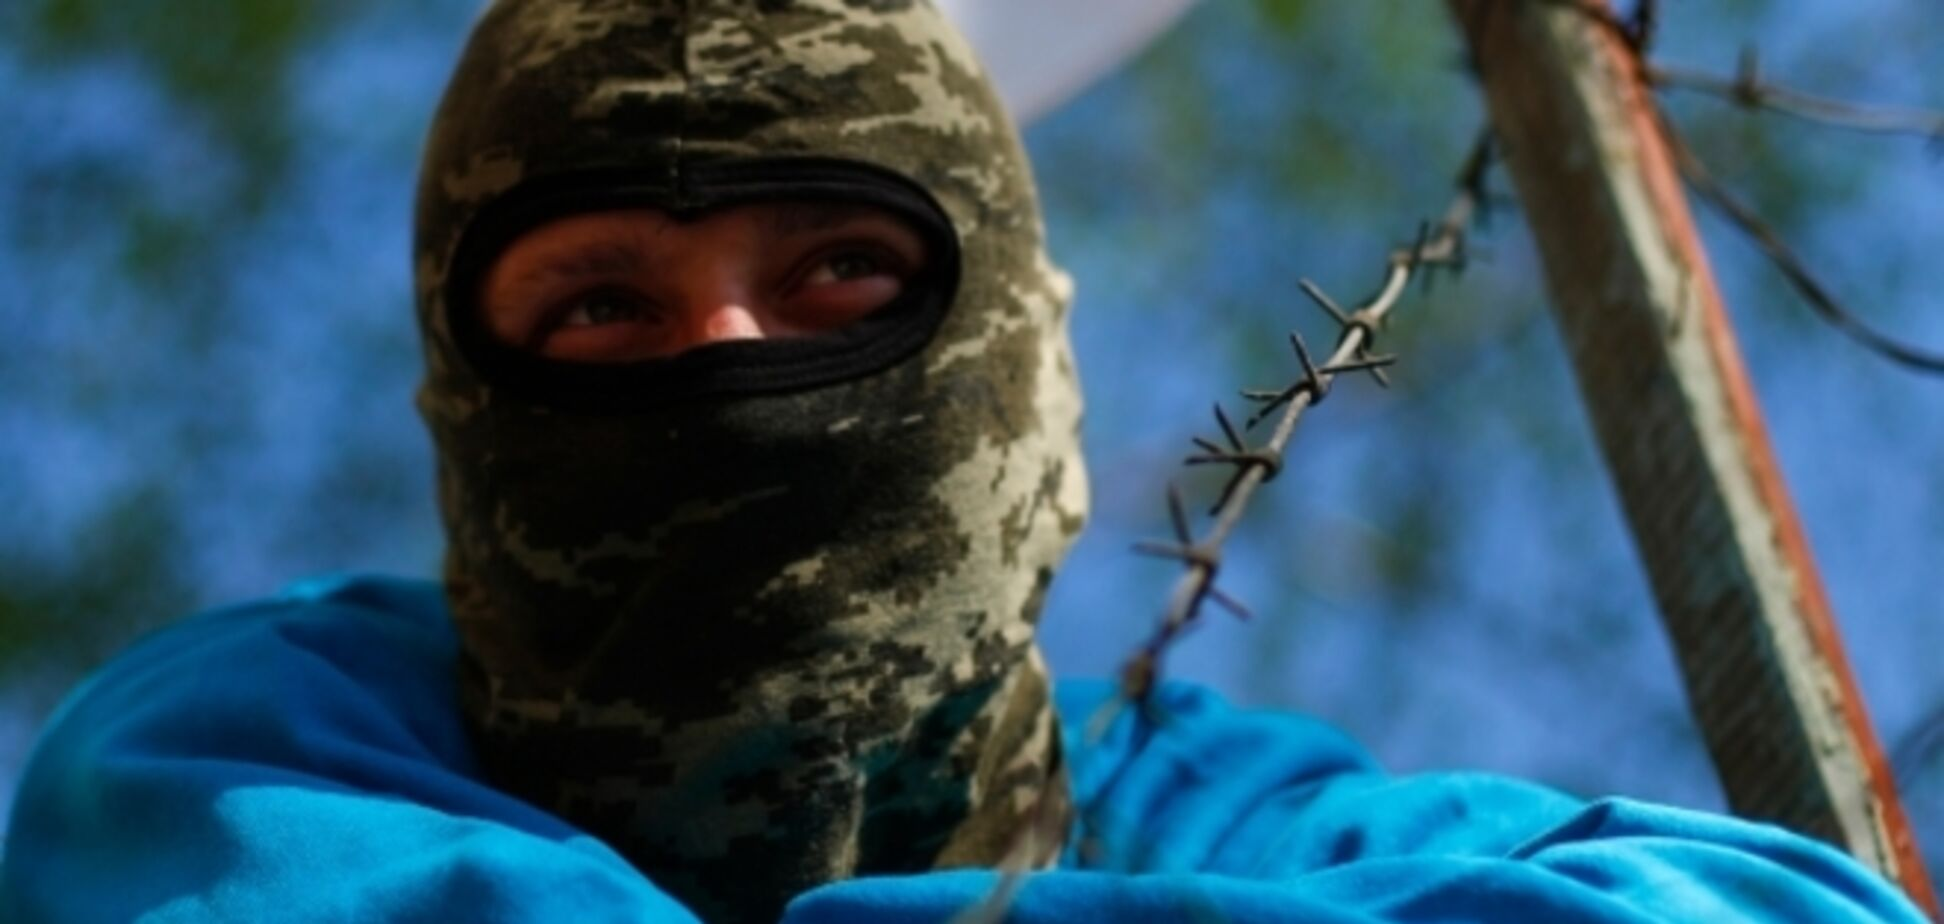 Террористы захватили в Славянске автобус с представителями ОБСЕ – МВД